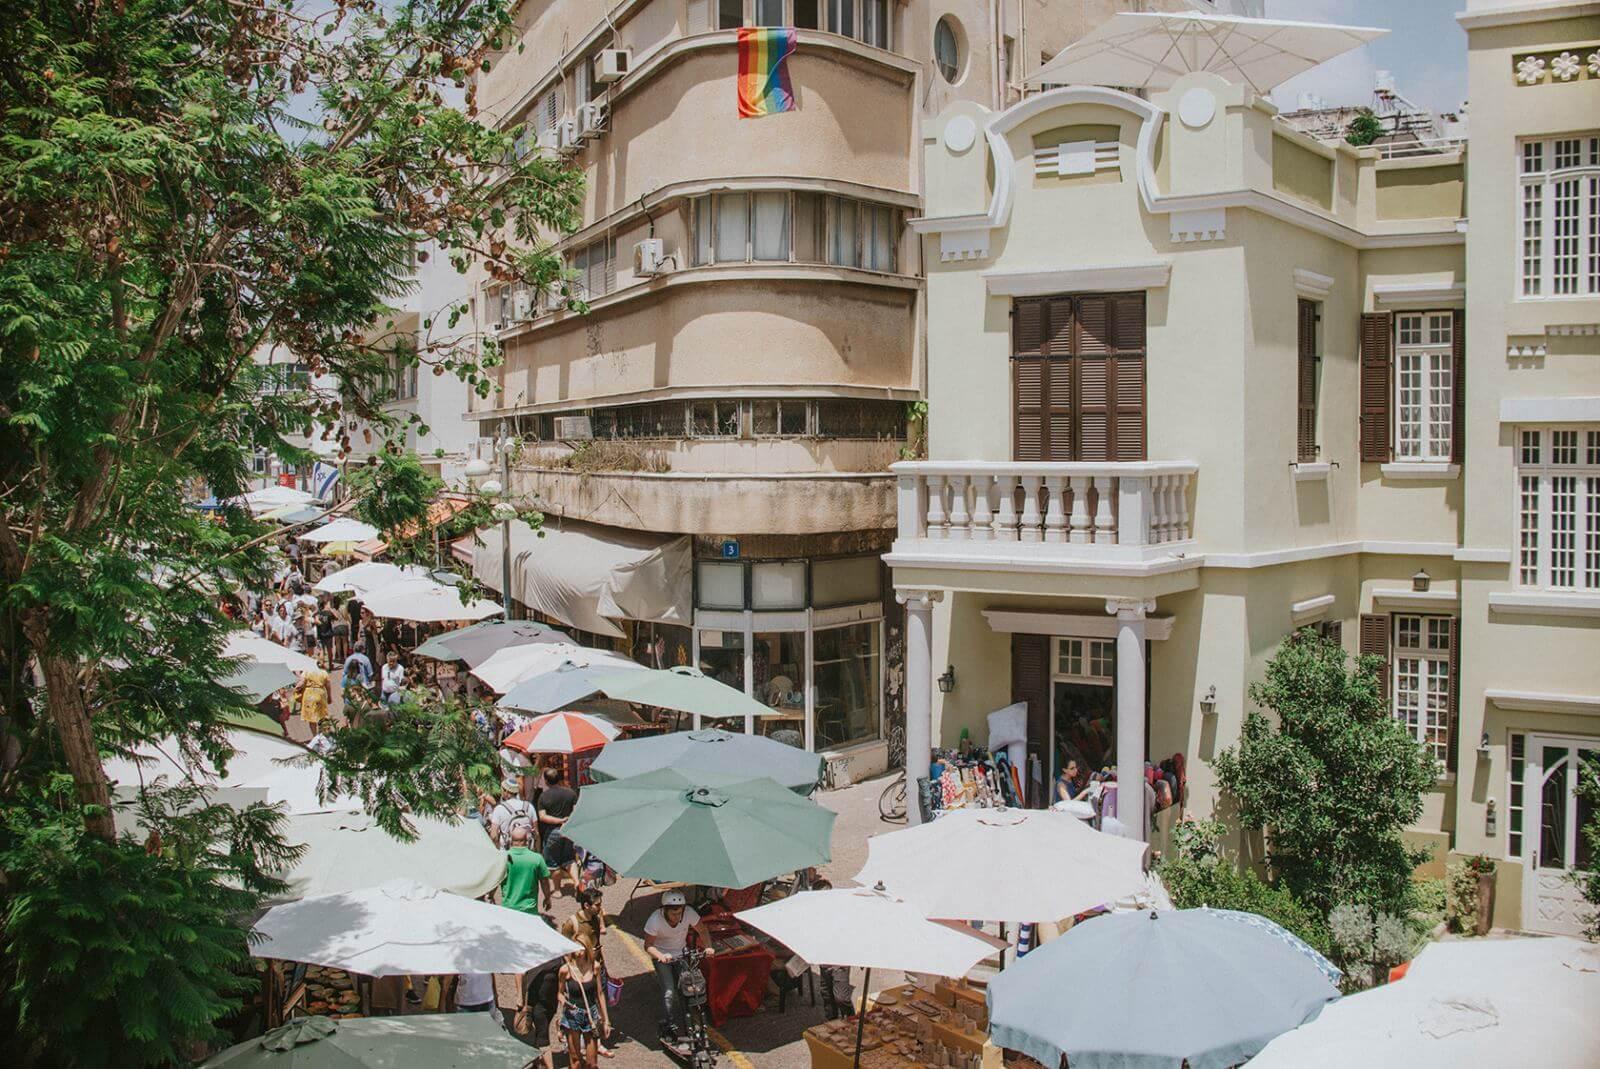 Carmel Market at Nahalat Benyamin Street